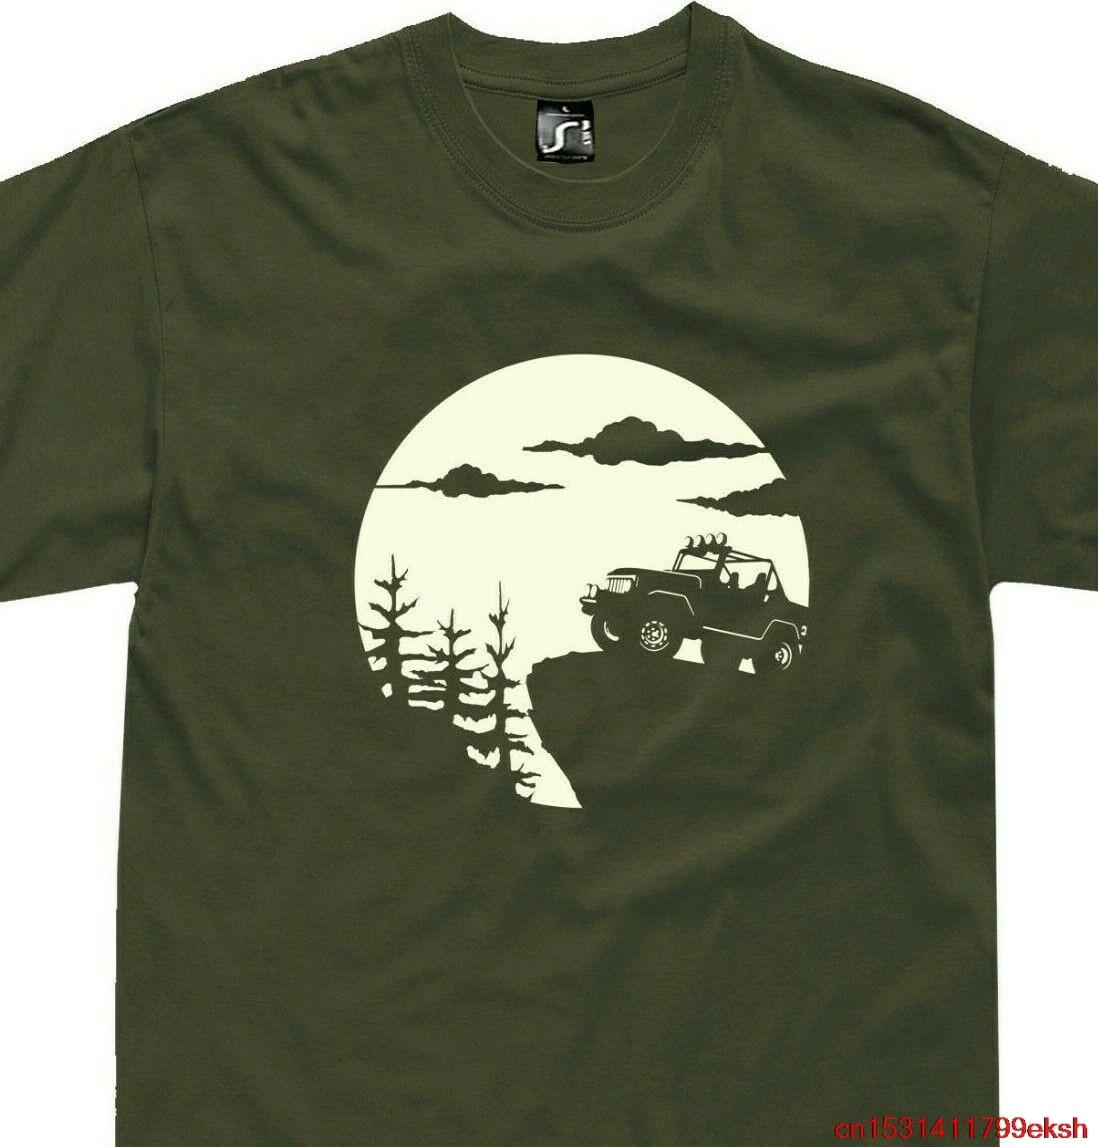 T-shirt Jeep yj tj jk 4x4 hors route t-shirt (S-5XL) mercedes